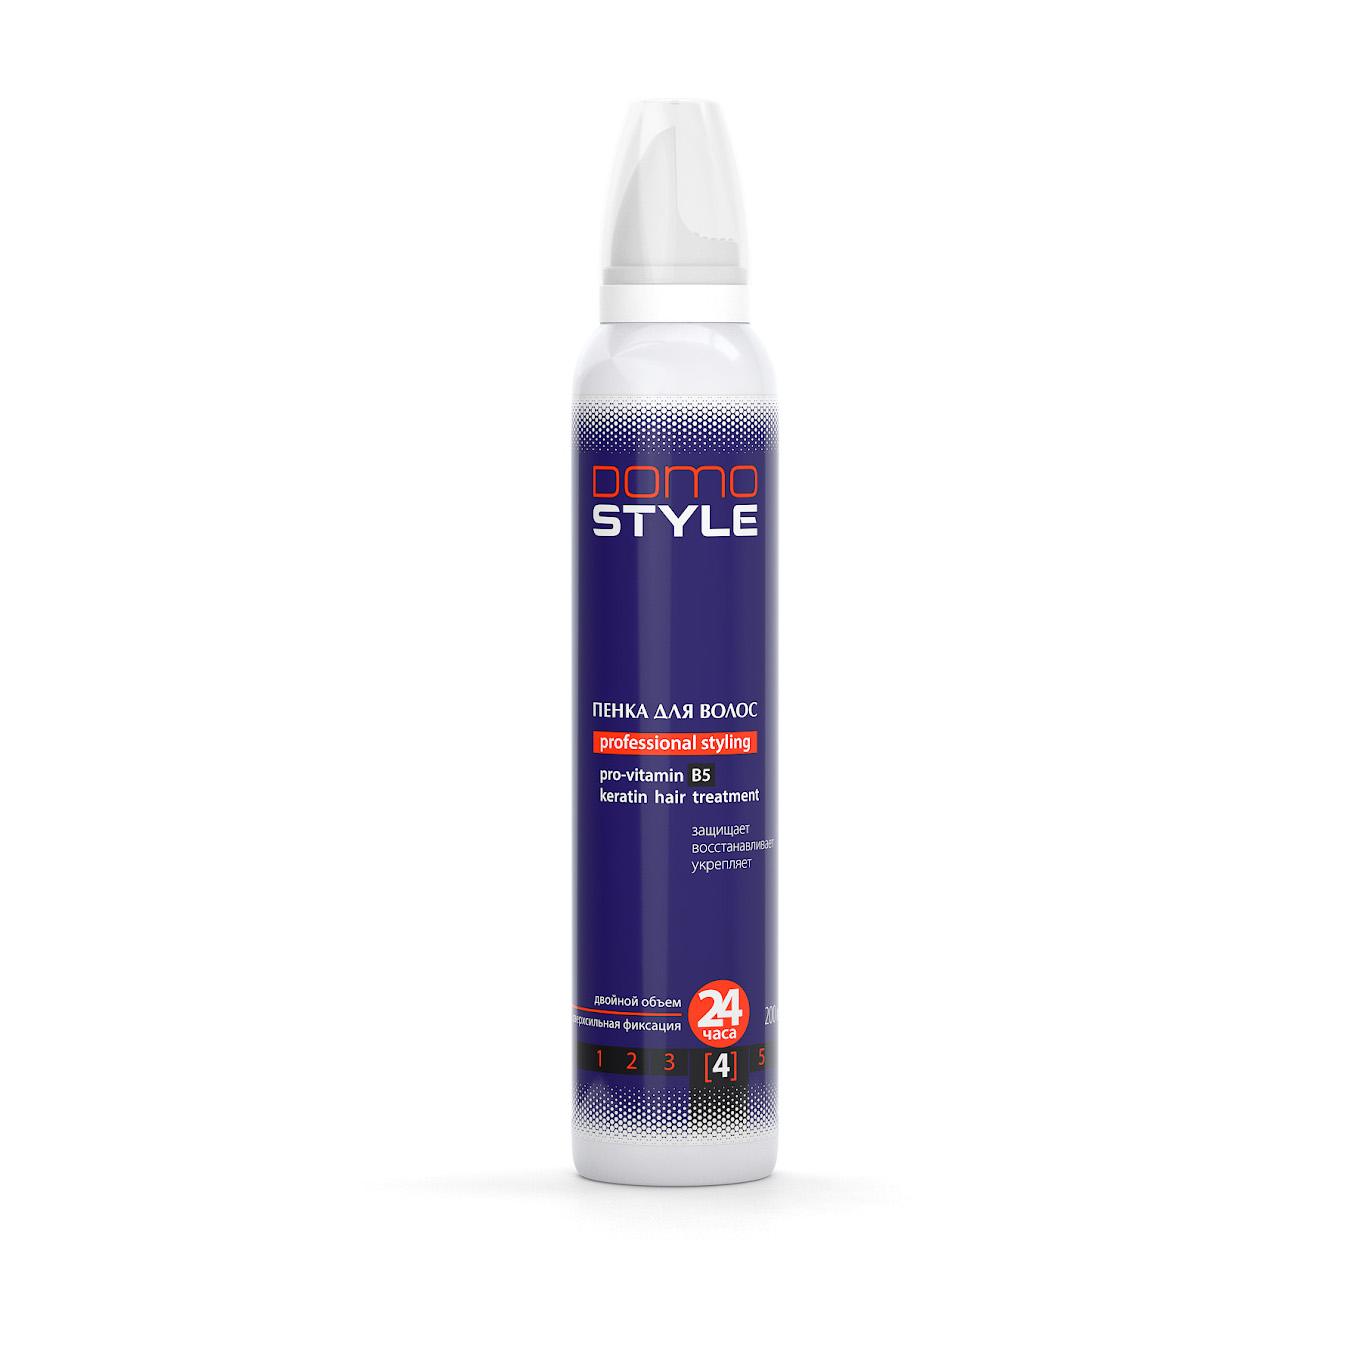 Domo Style 4 - пенка для волос, сверхсильная фиксация (200мл) XD 20005